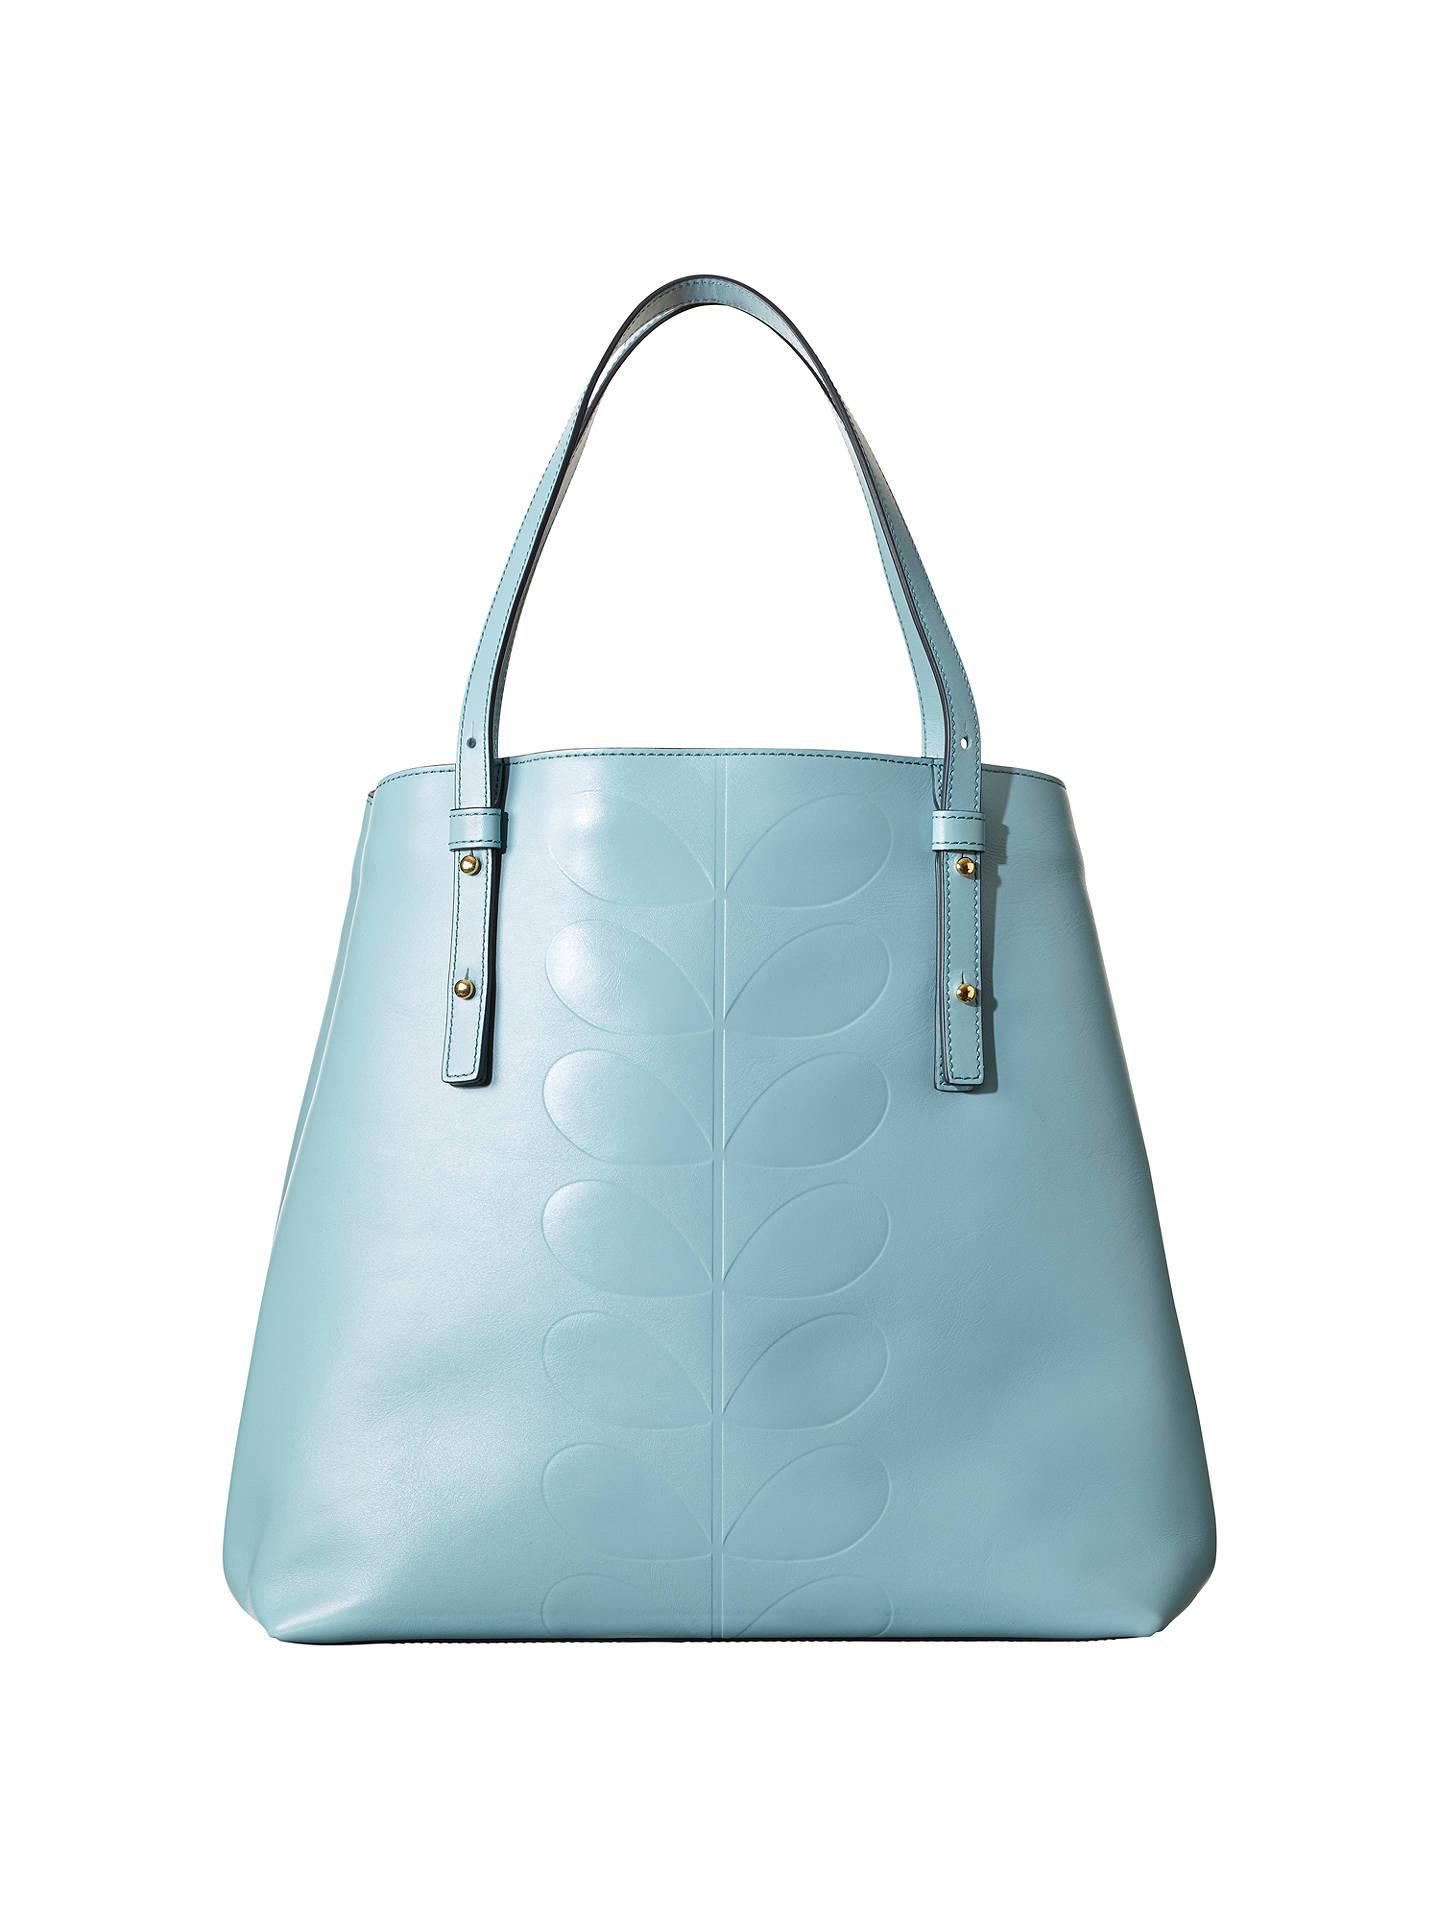 Leather Tote Bag Blue At John Lewis